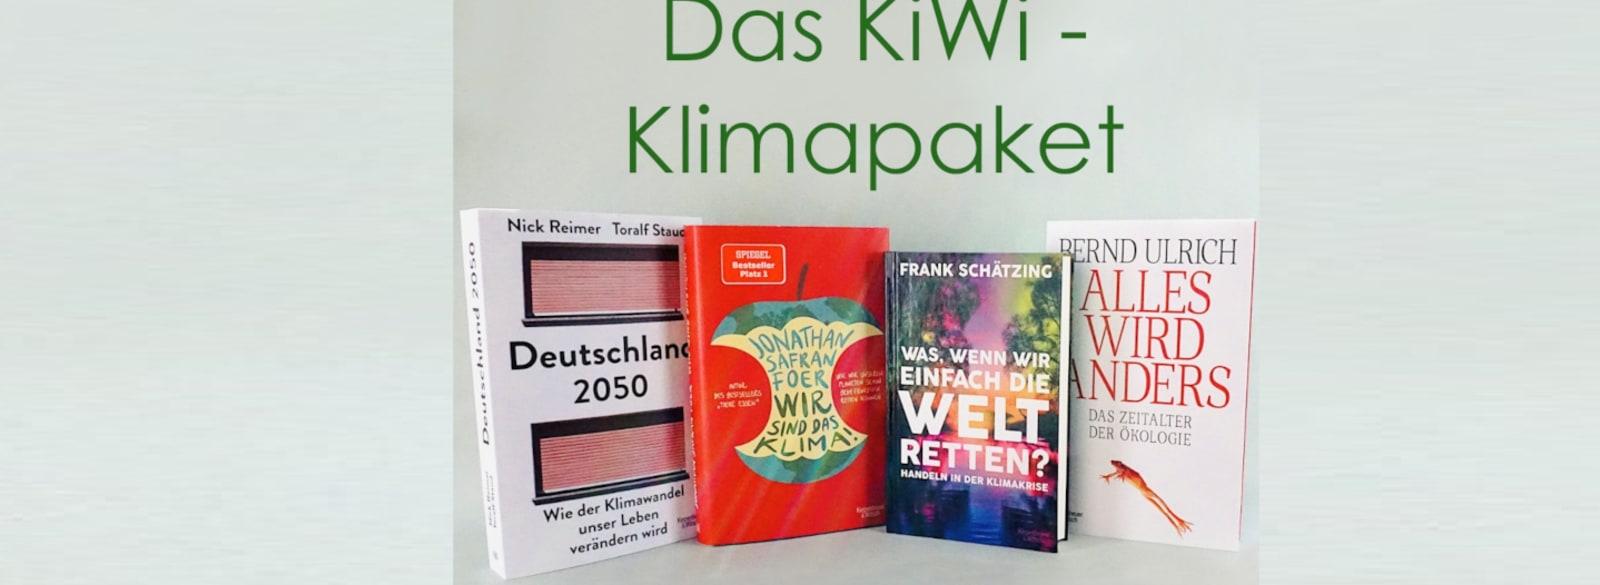 banner_kiwi_klimapaket_1440x585.png